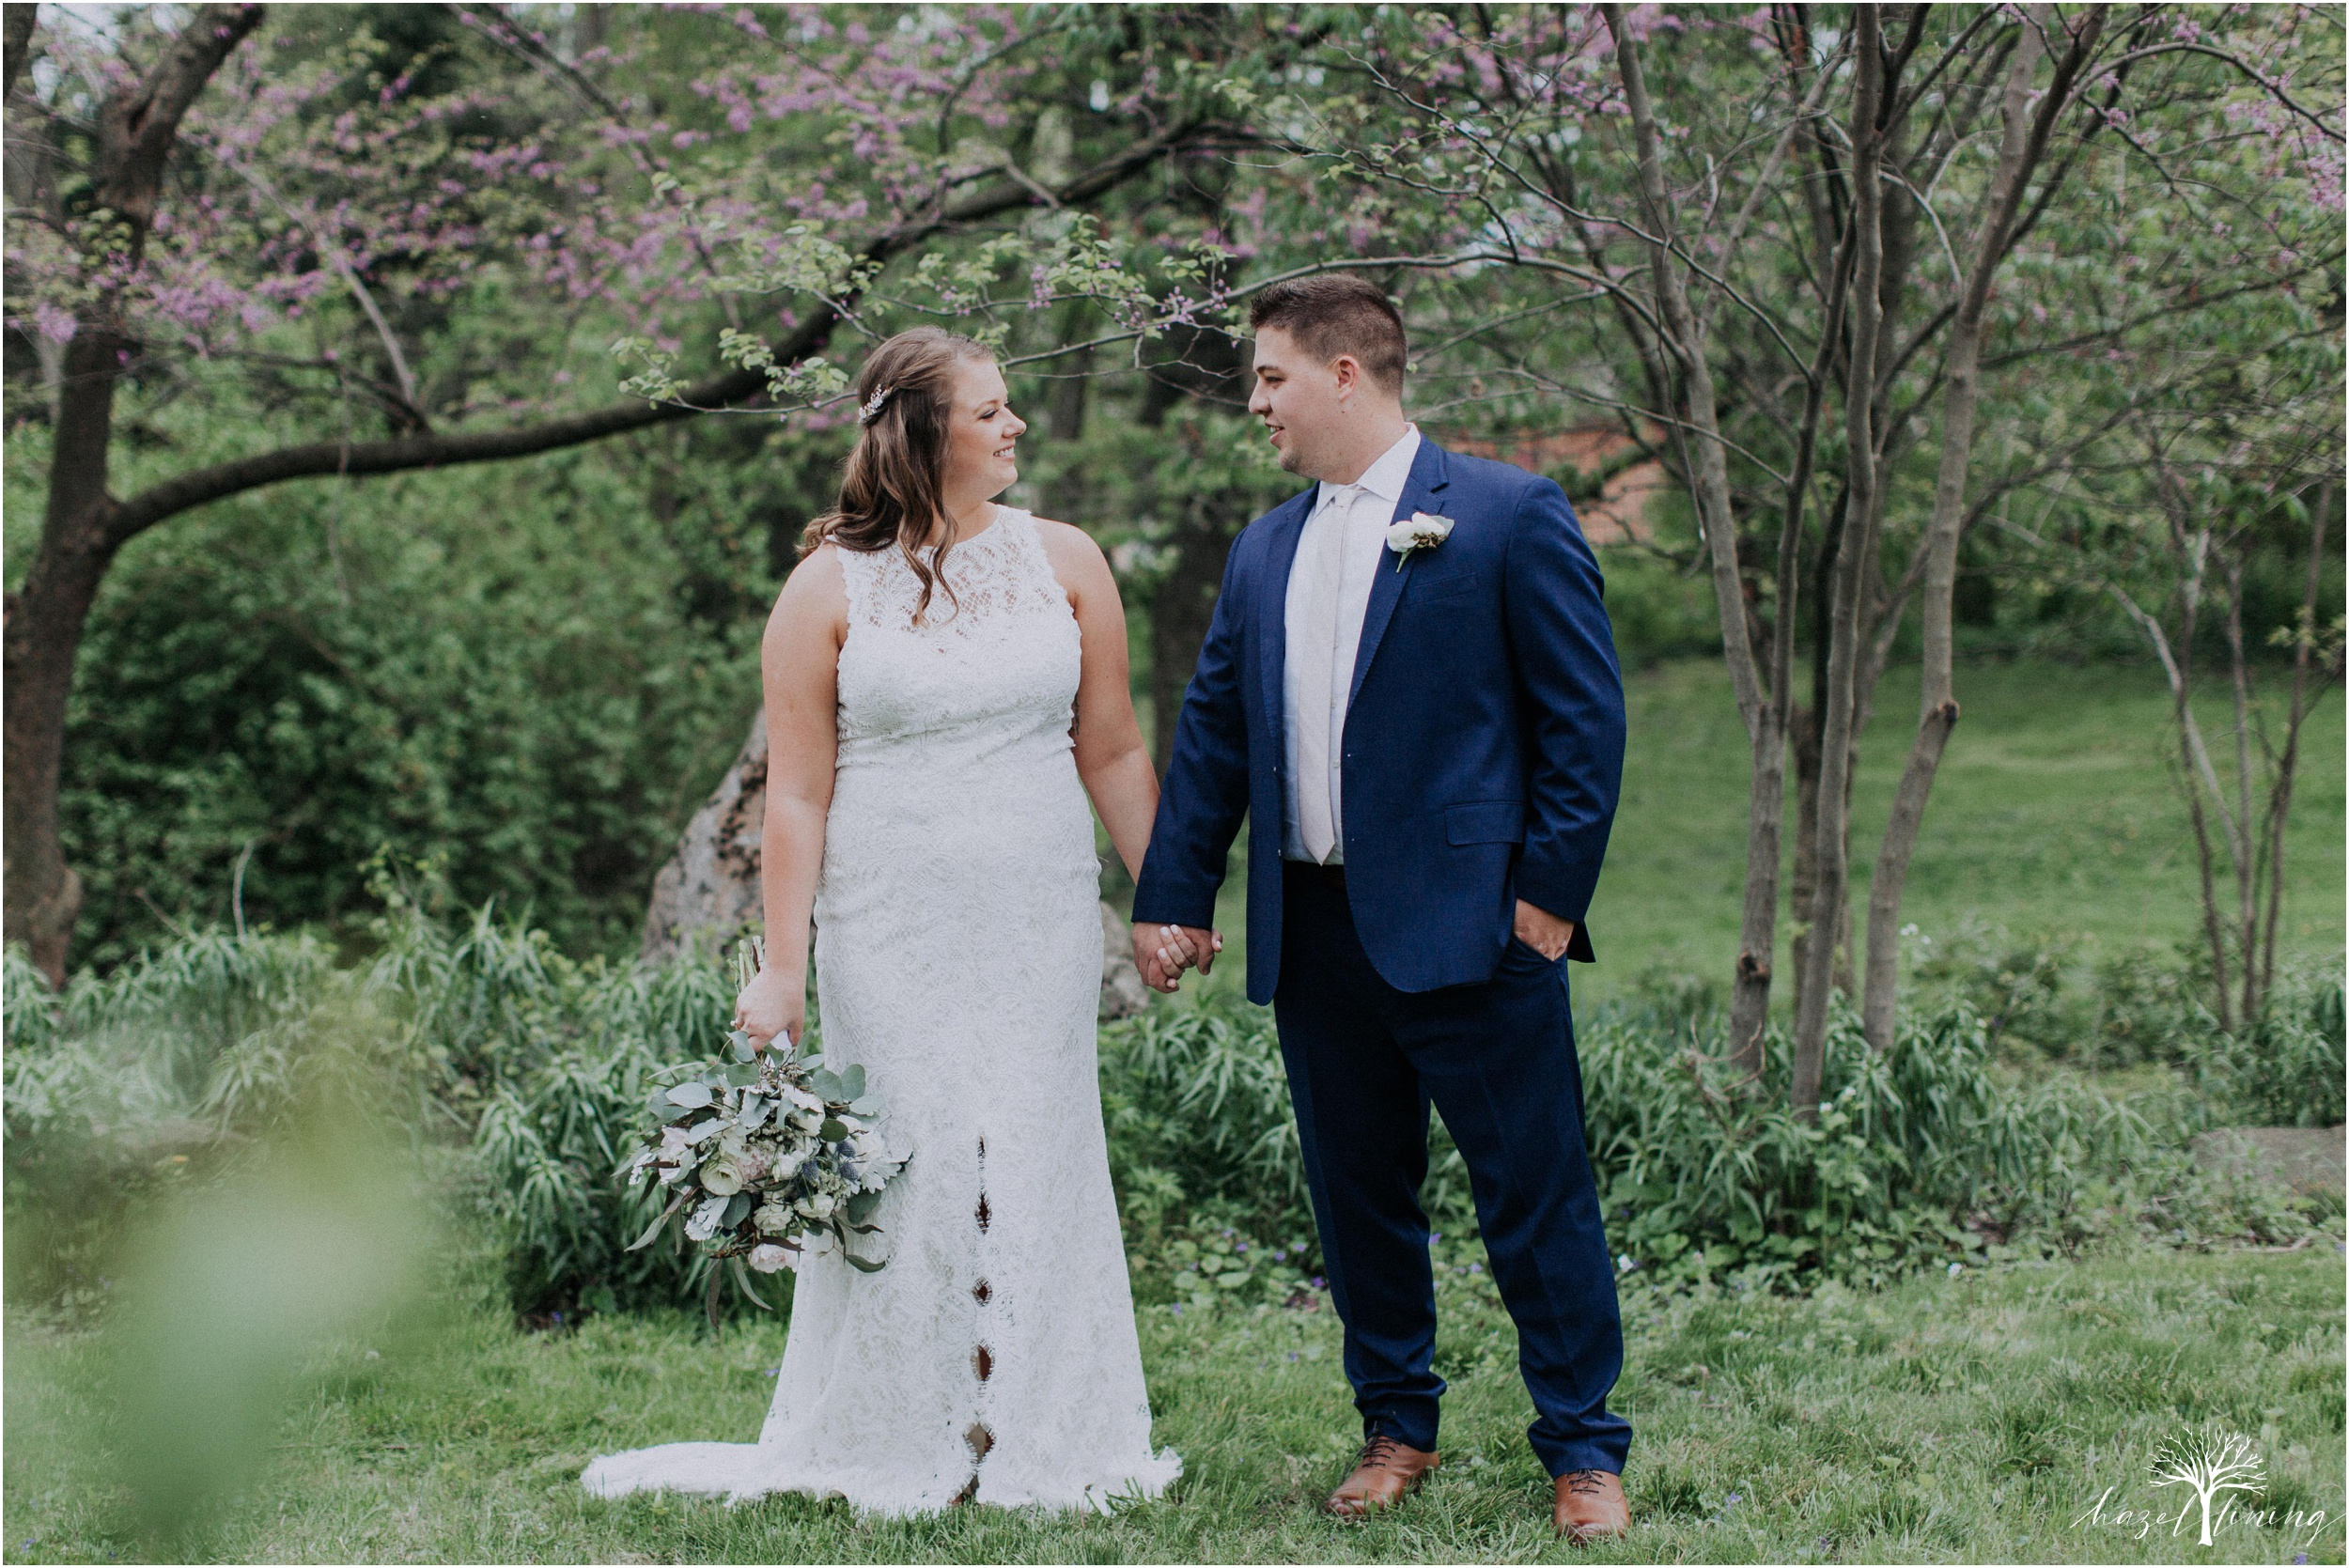 hazel-lining-travel-wedding-elopement-photography-abby-skyler-hunt-the-willis-house-york-pennsylvania-outdoor-estate-wedding_0031.jpg